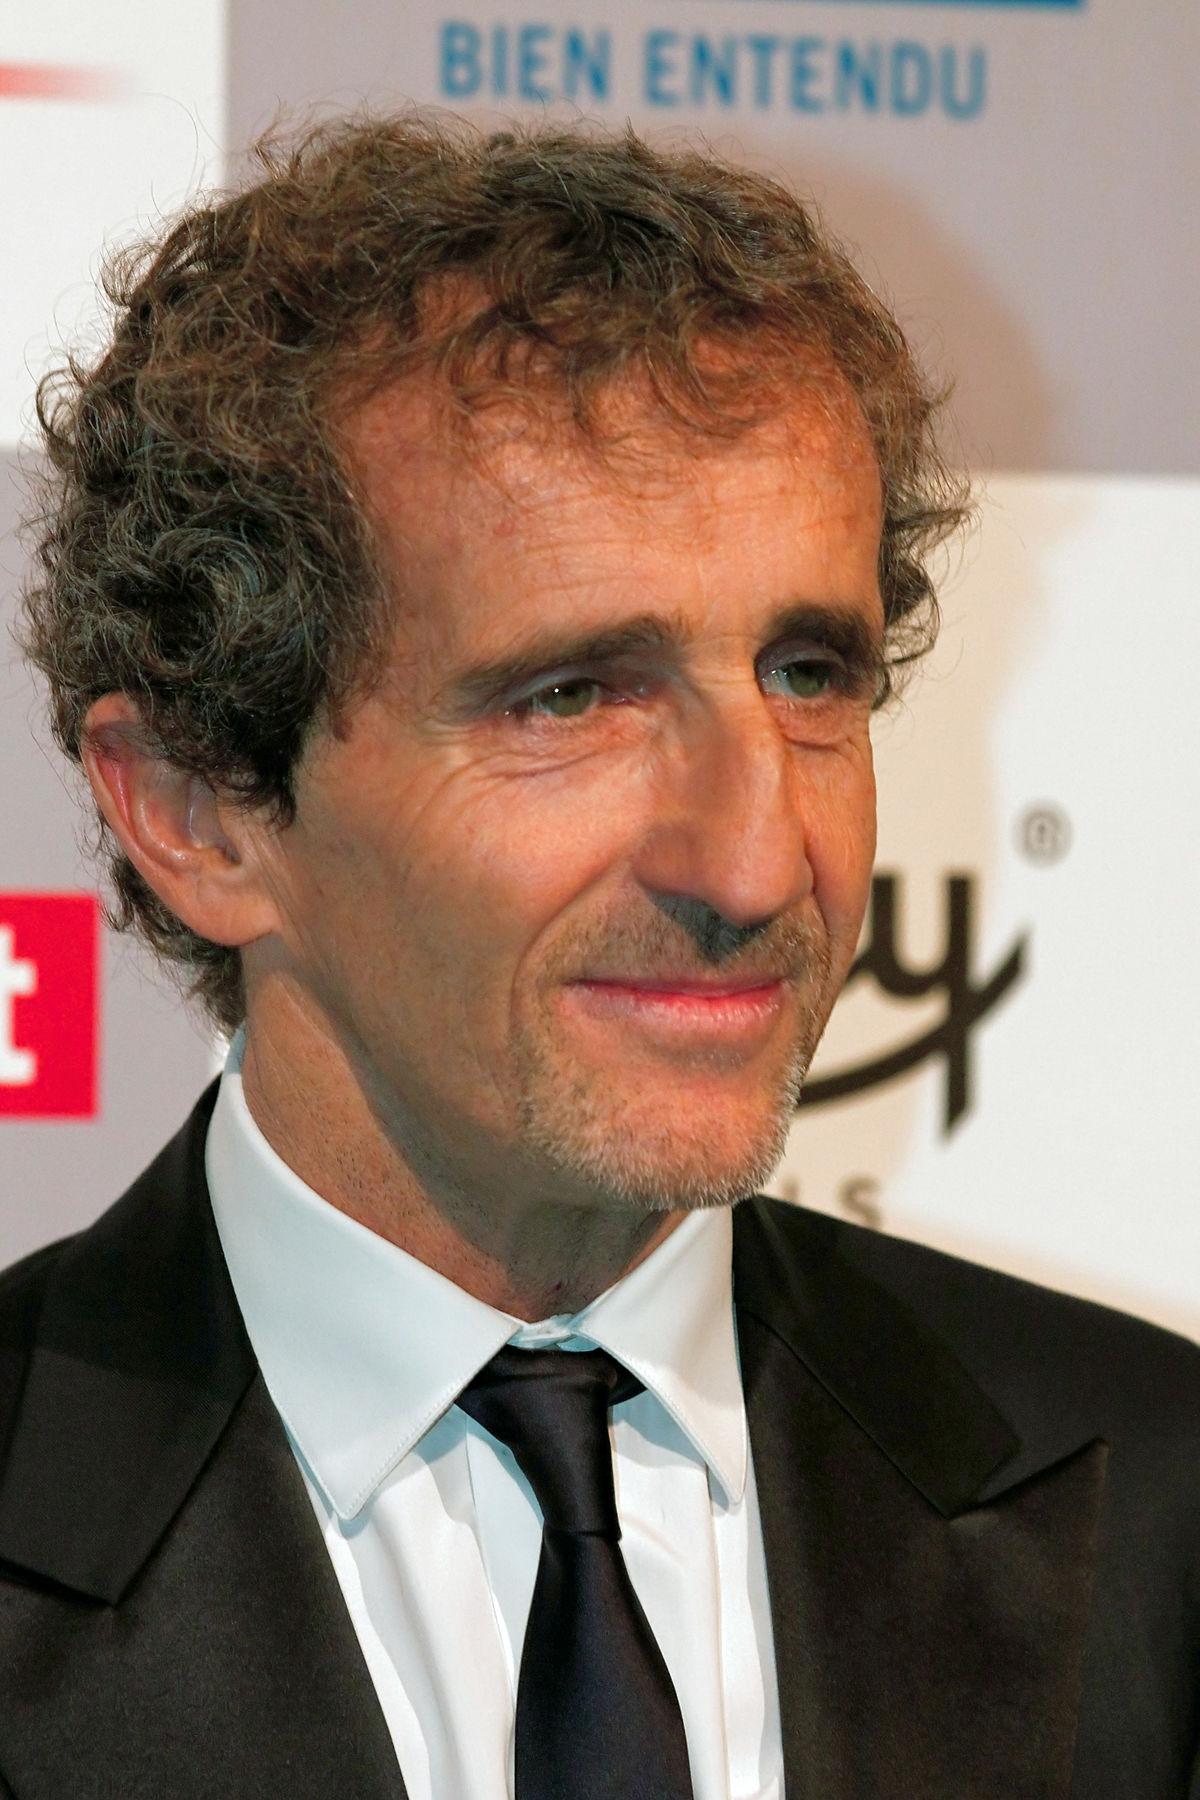 Alain Prost Anne-marie Prost : alain, prost, anne-marie, Alain, Prost, Wikipedia